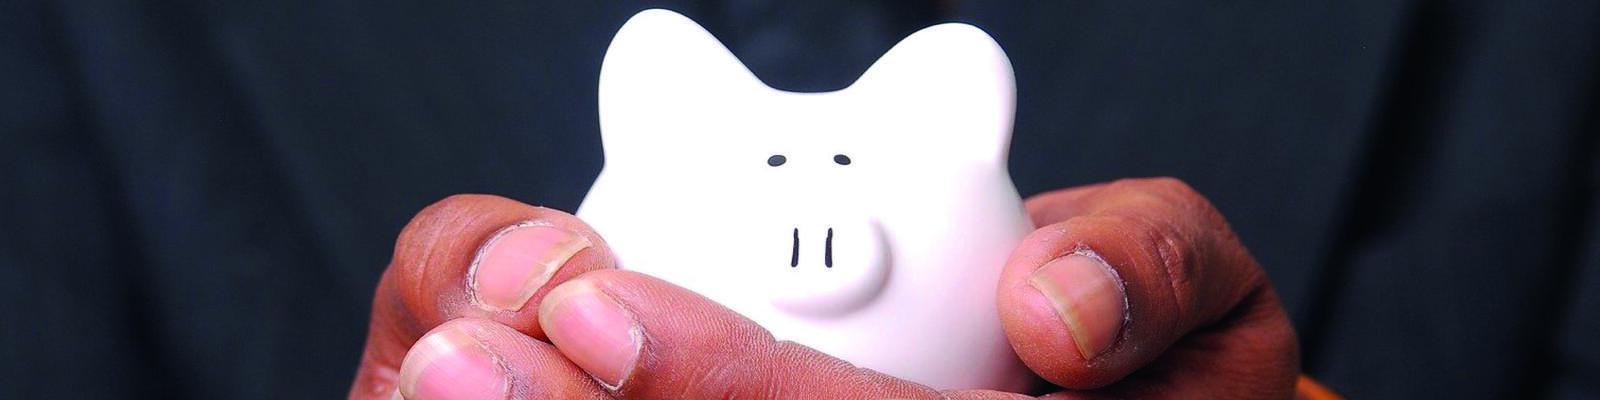 Financiële hulp